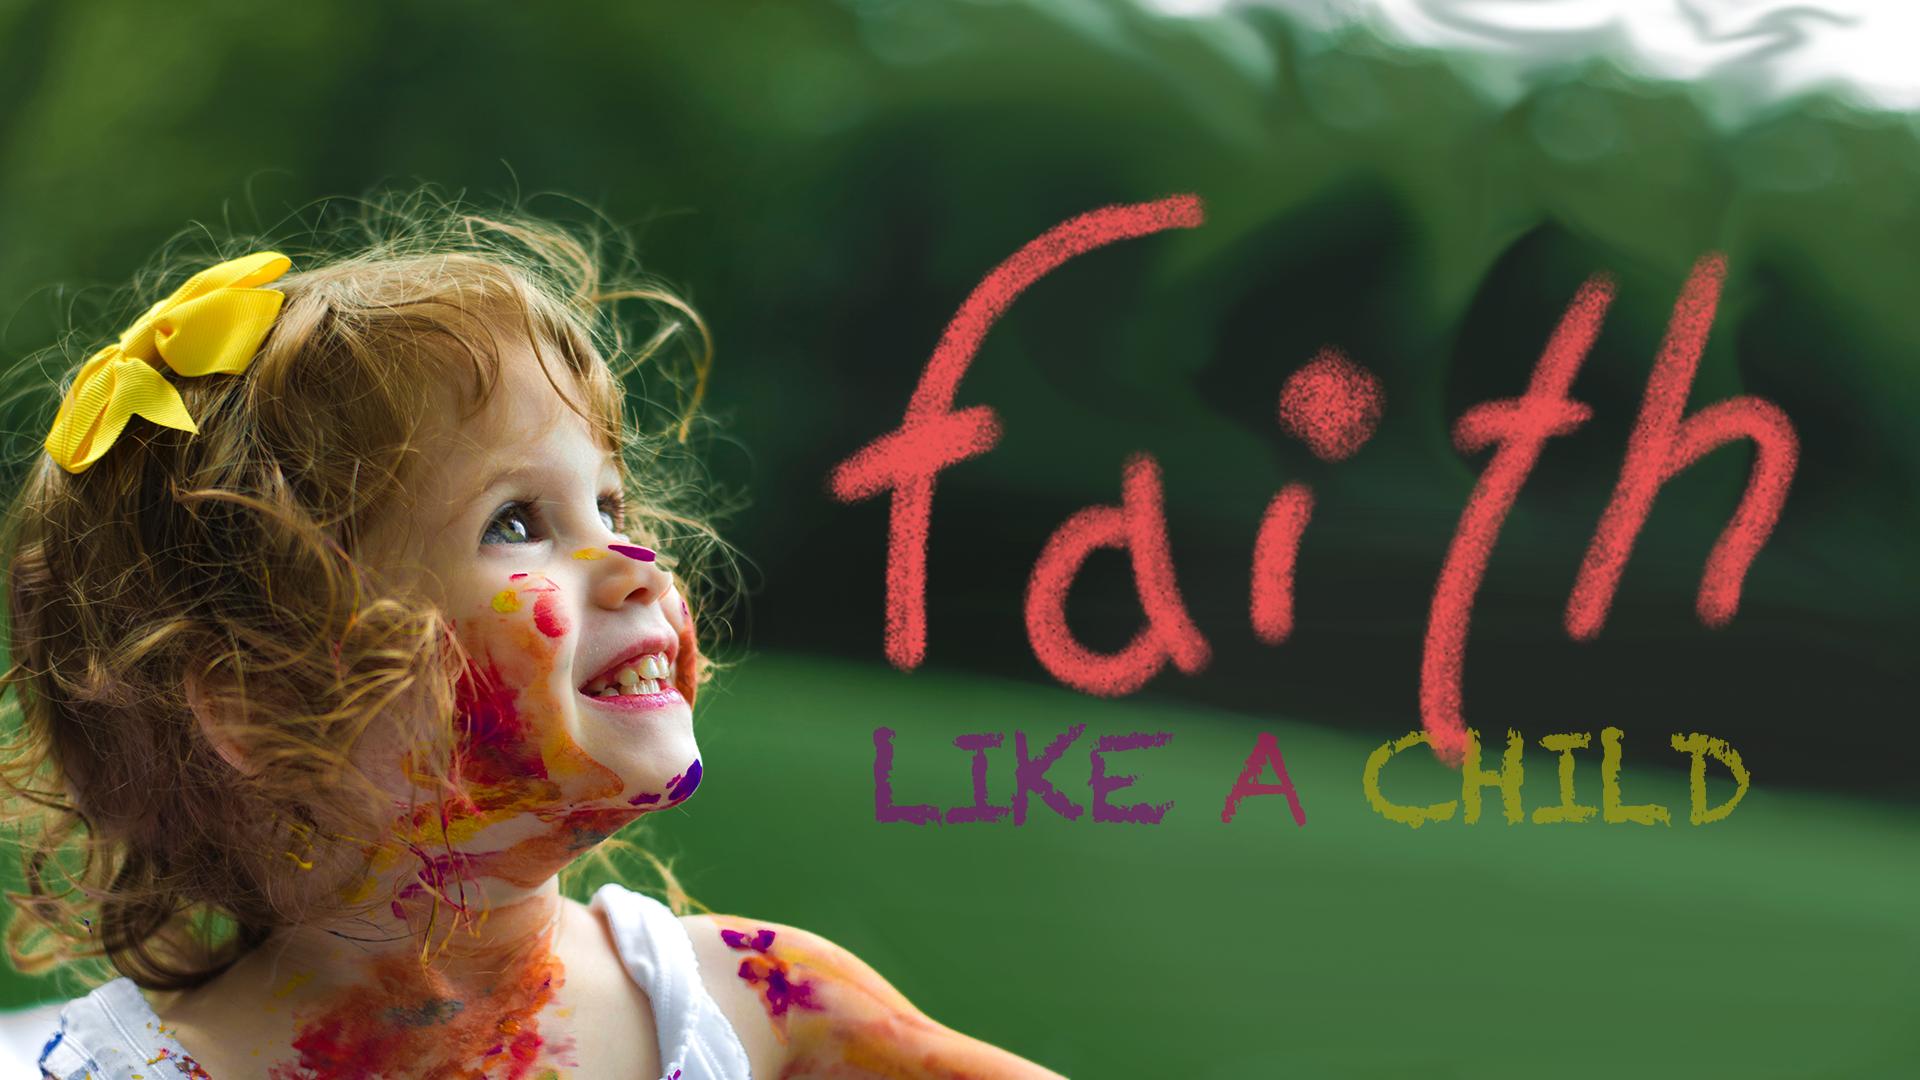 faith-like-a-child2.png